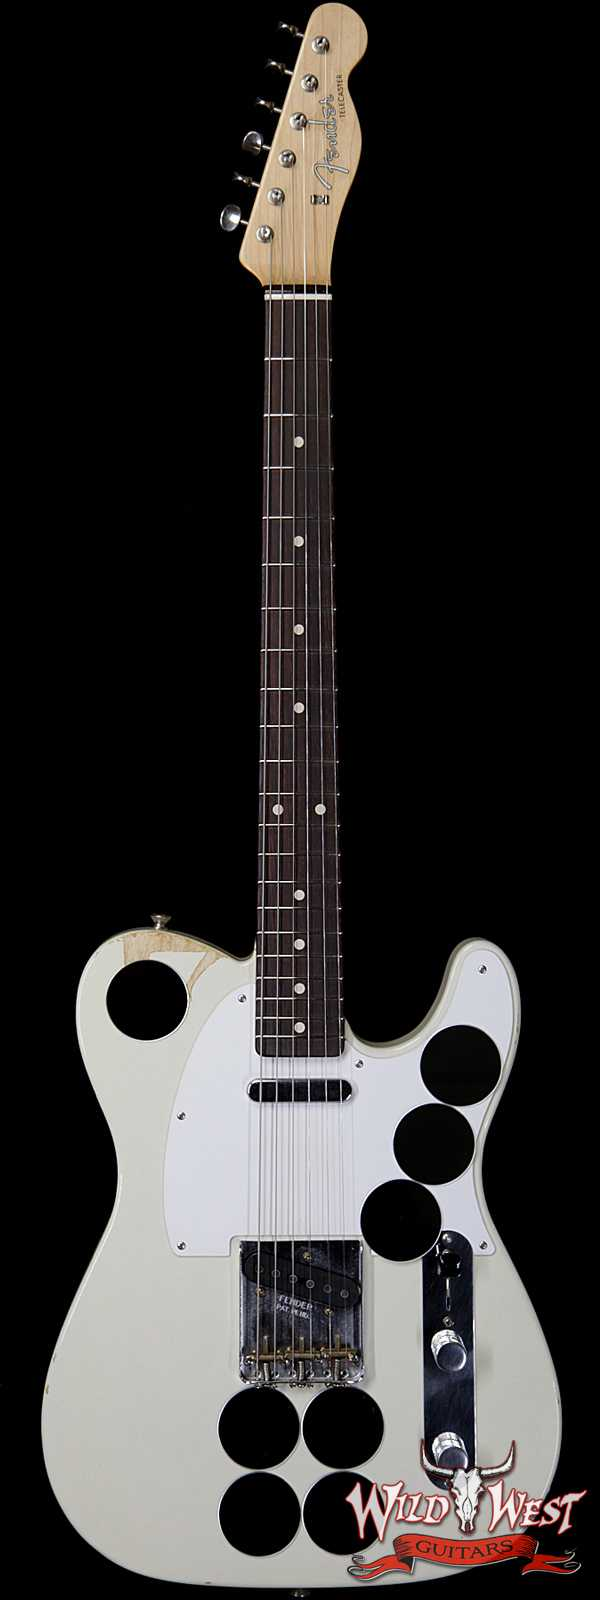 Fender Custom Shop Paul Waller Masterbuilt Jimmy Page Mirrored Telecaster